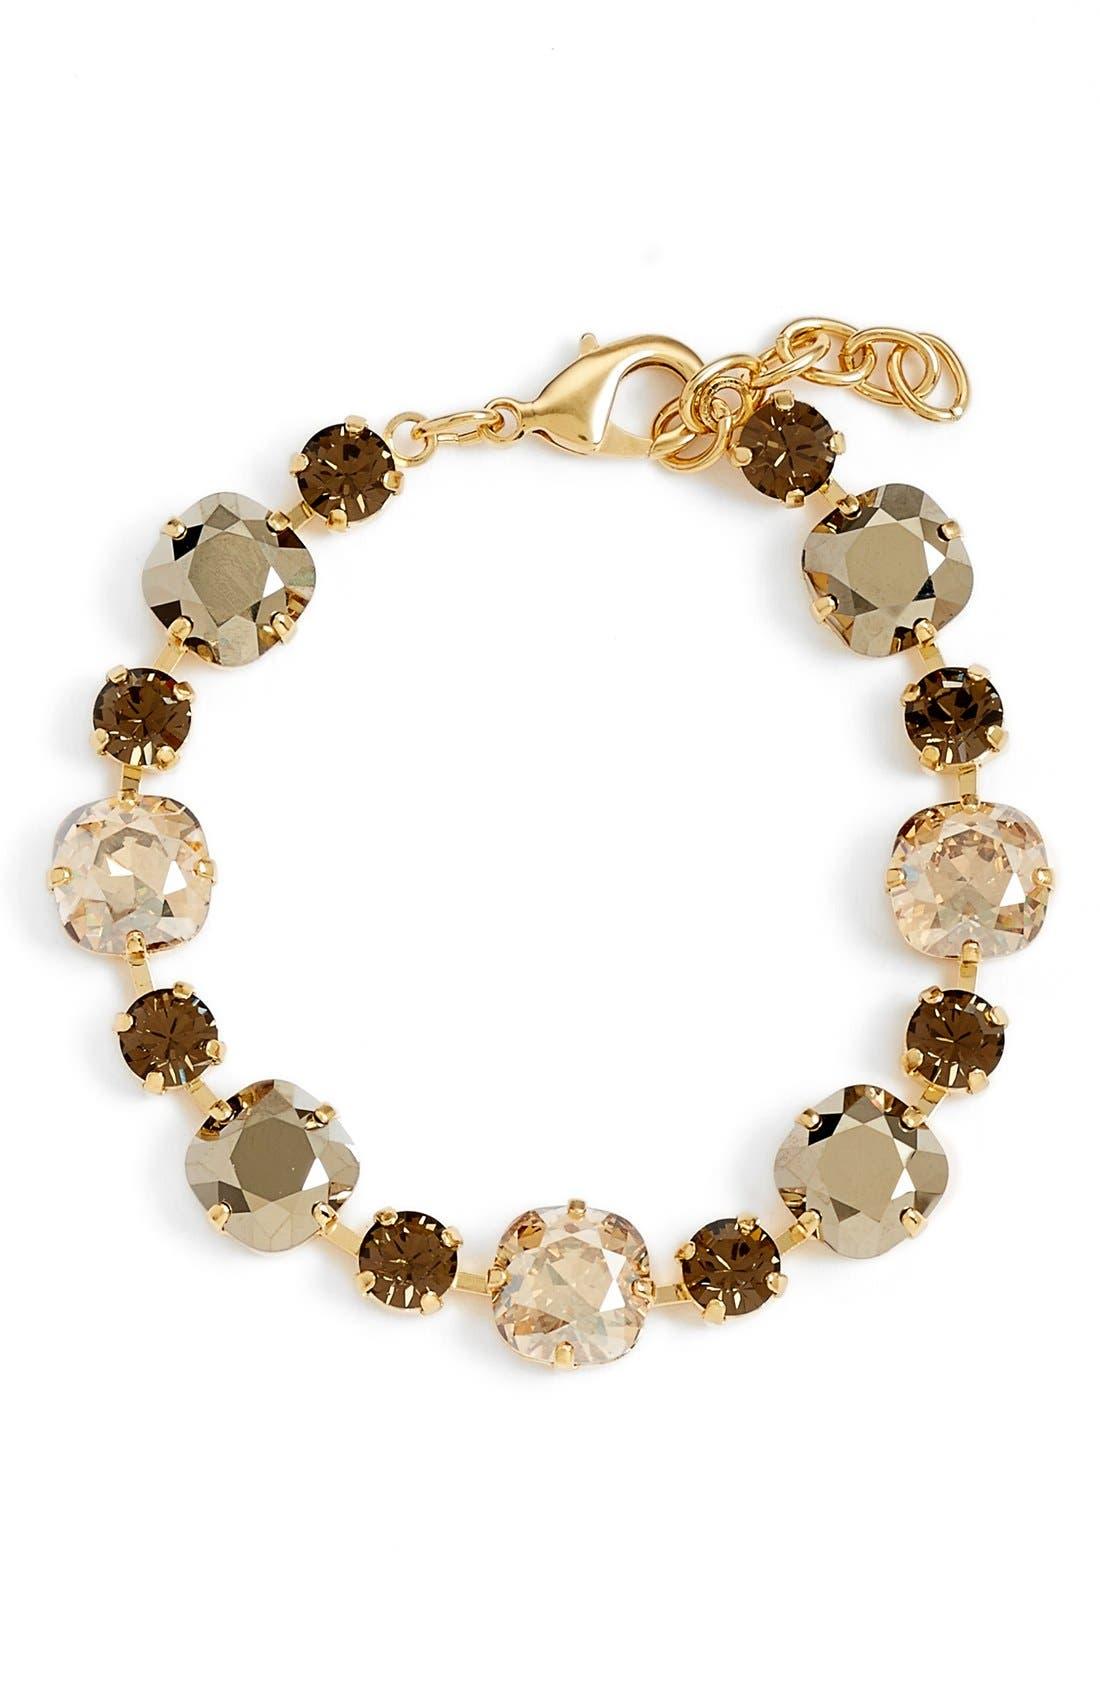 'Audrey' Multi Stone Bracelet,                         Main,                         color, Cryrosegld/ Topaz/ Top/ Gold